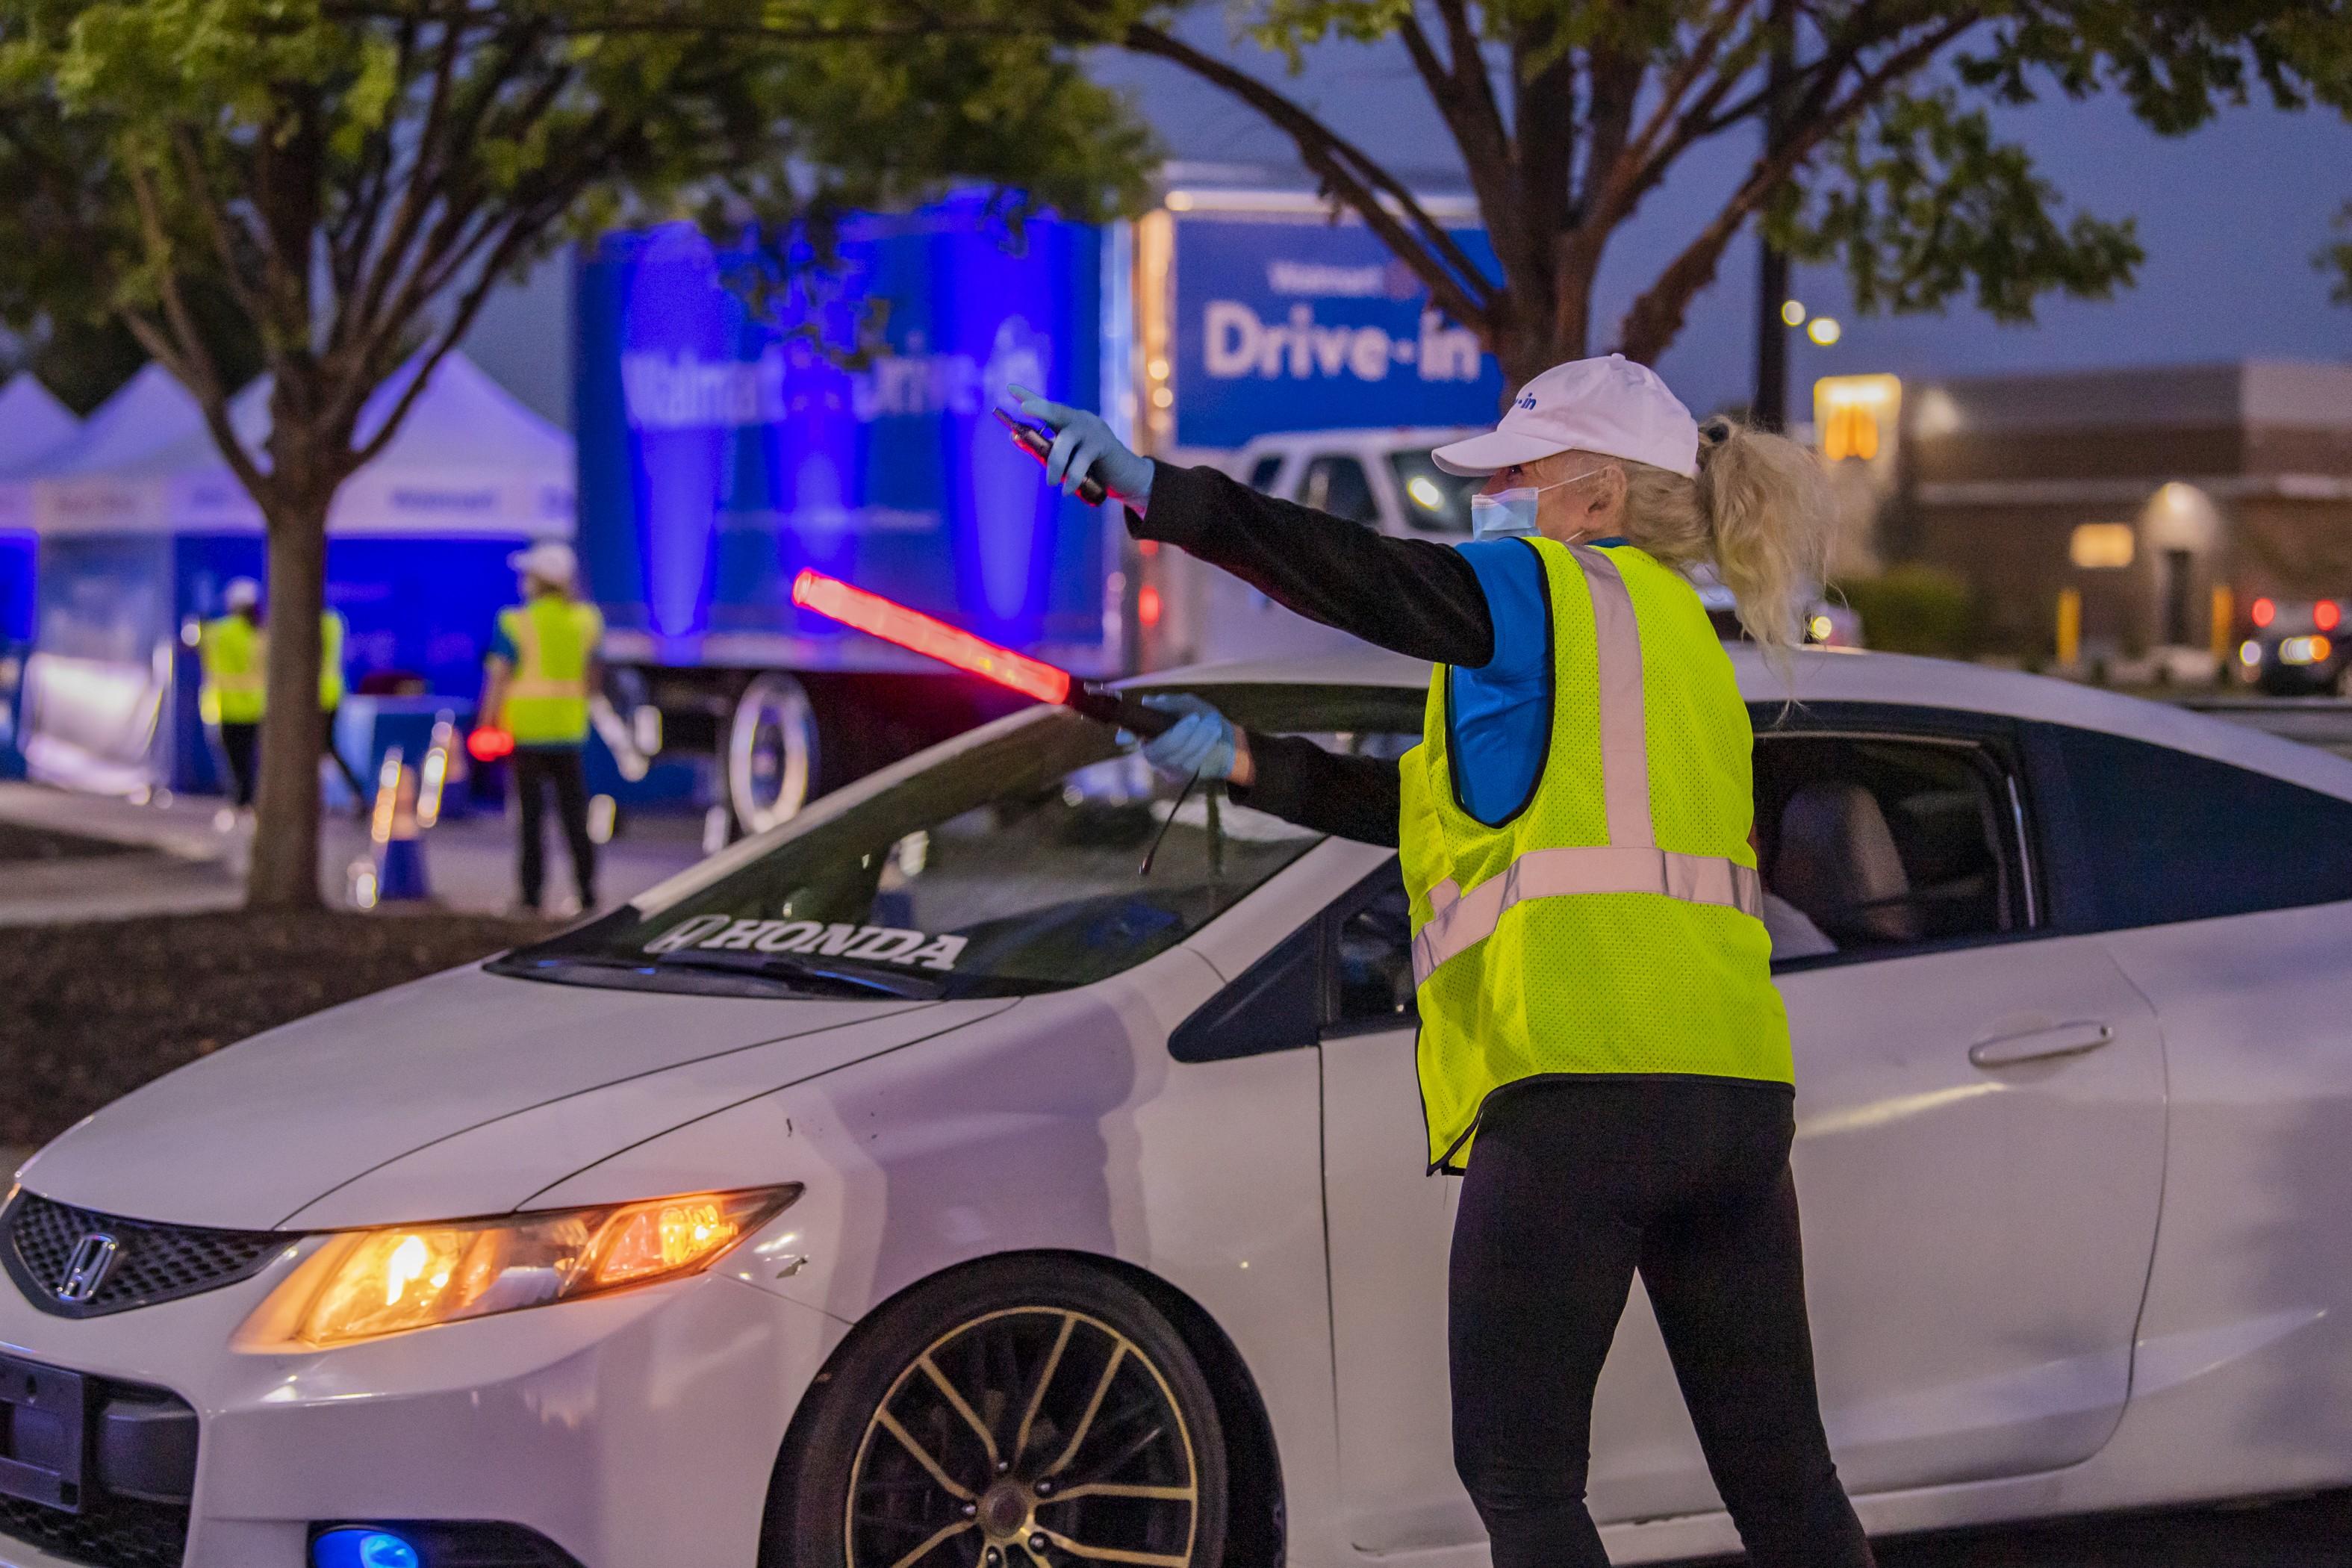 Walmart Drive-In associate directing traffic